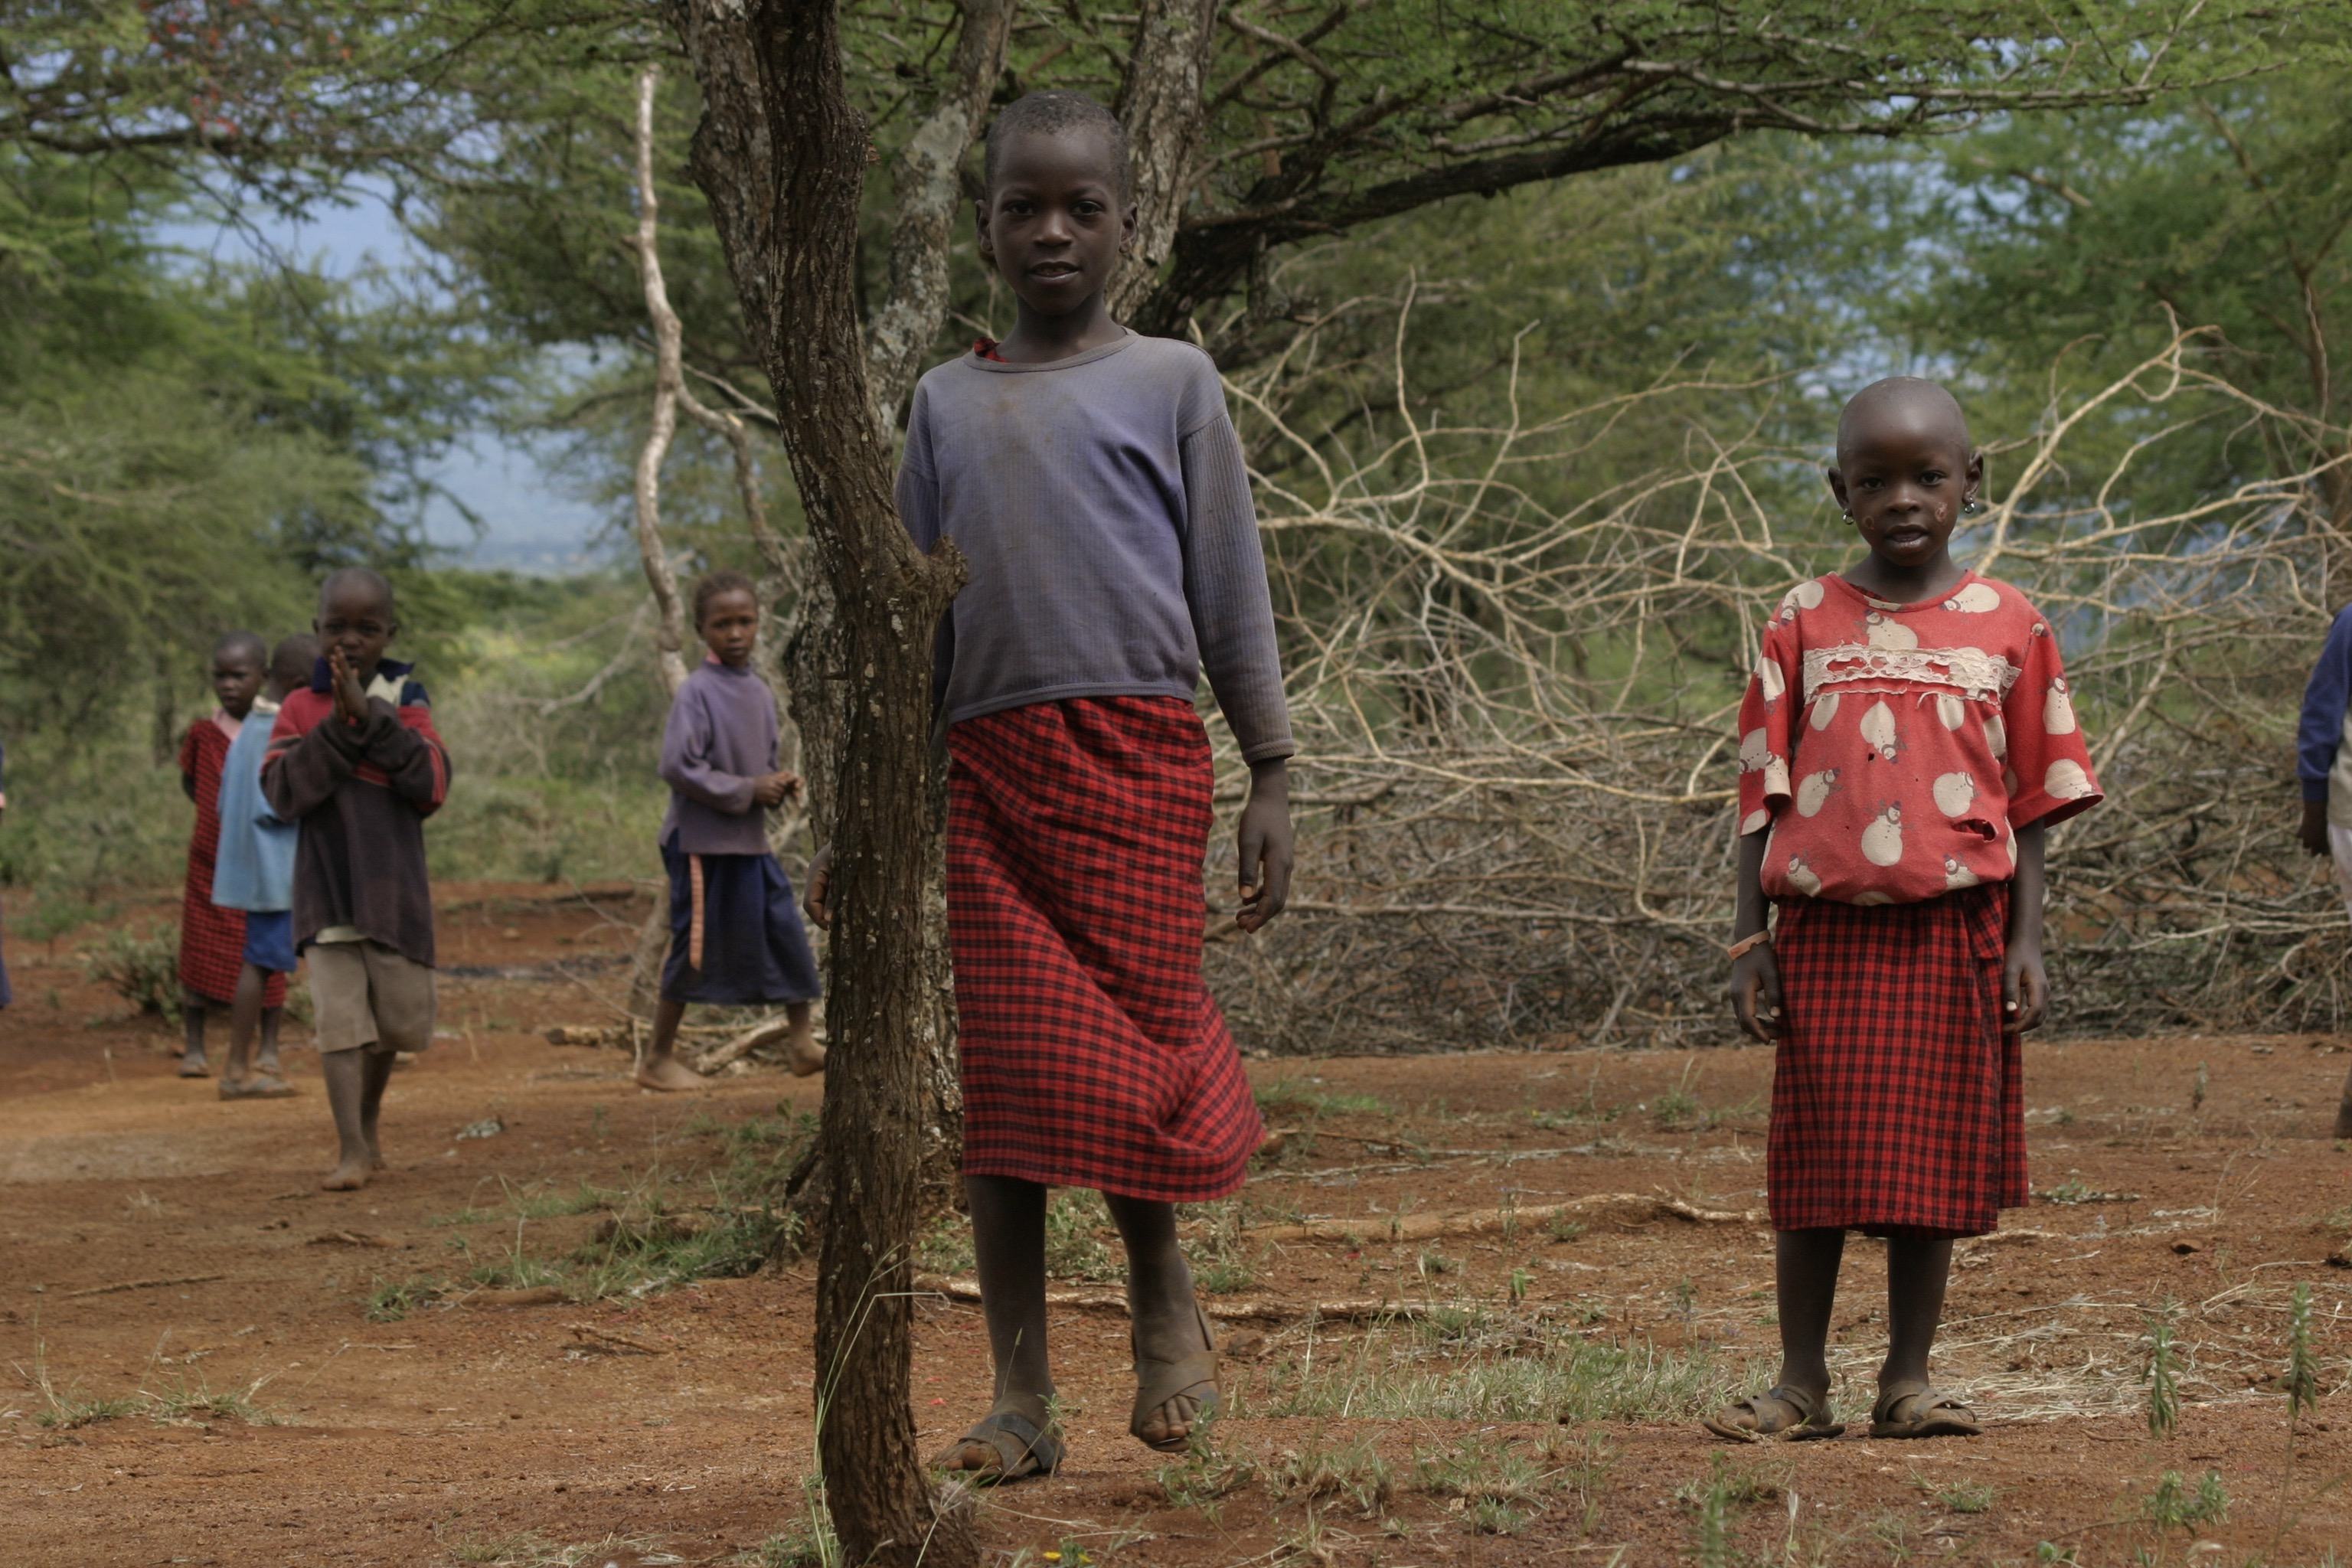 March 22 – Learning Maasai singing